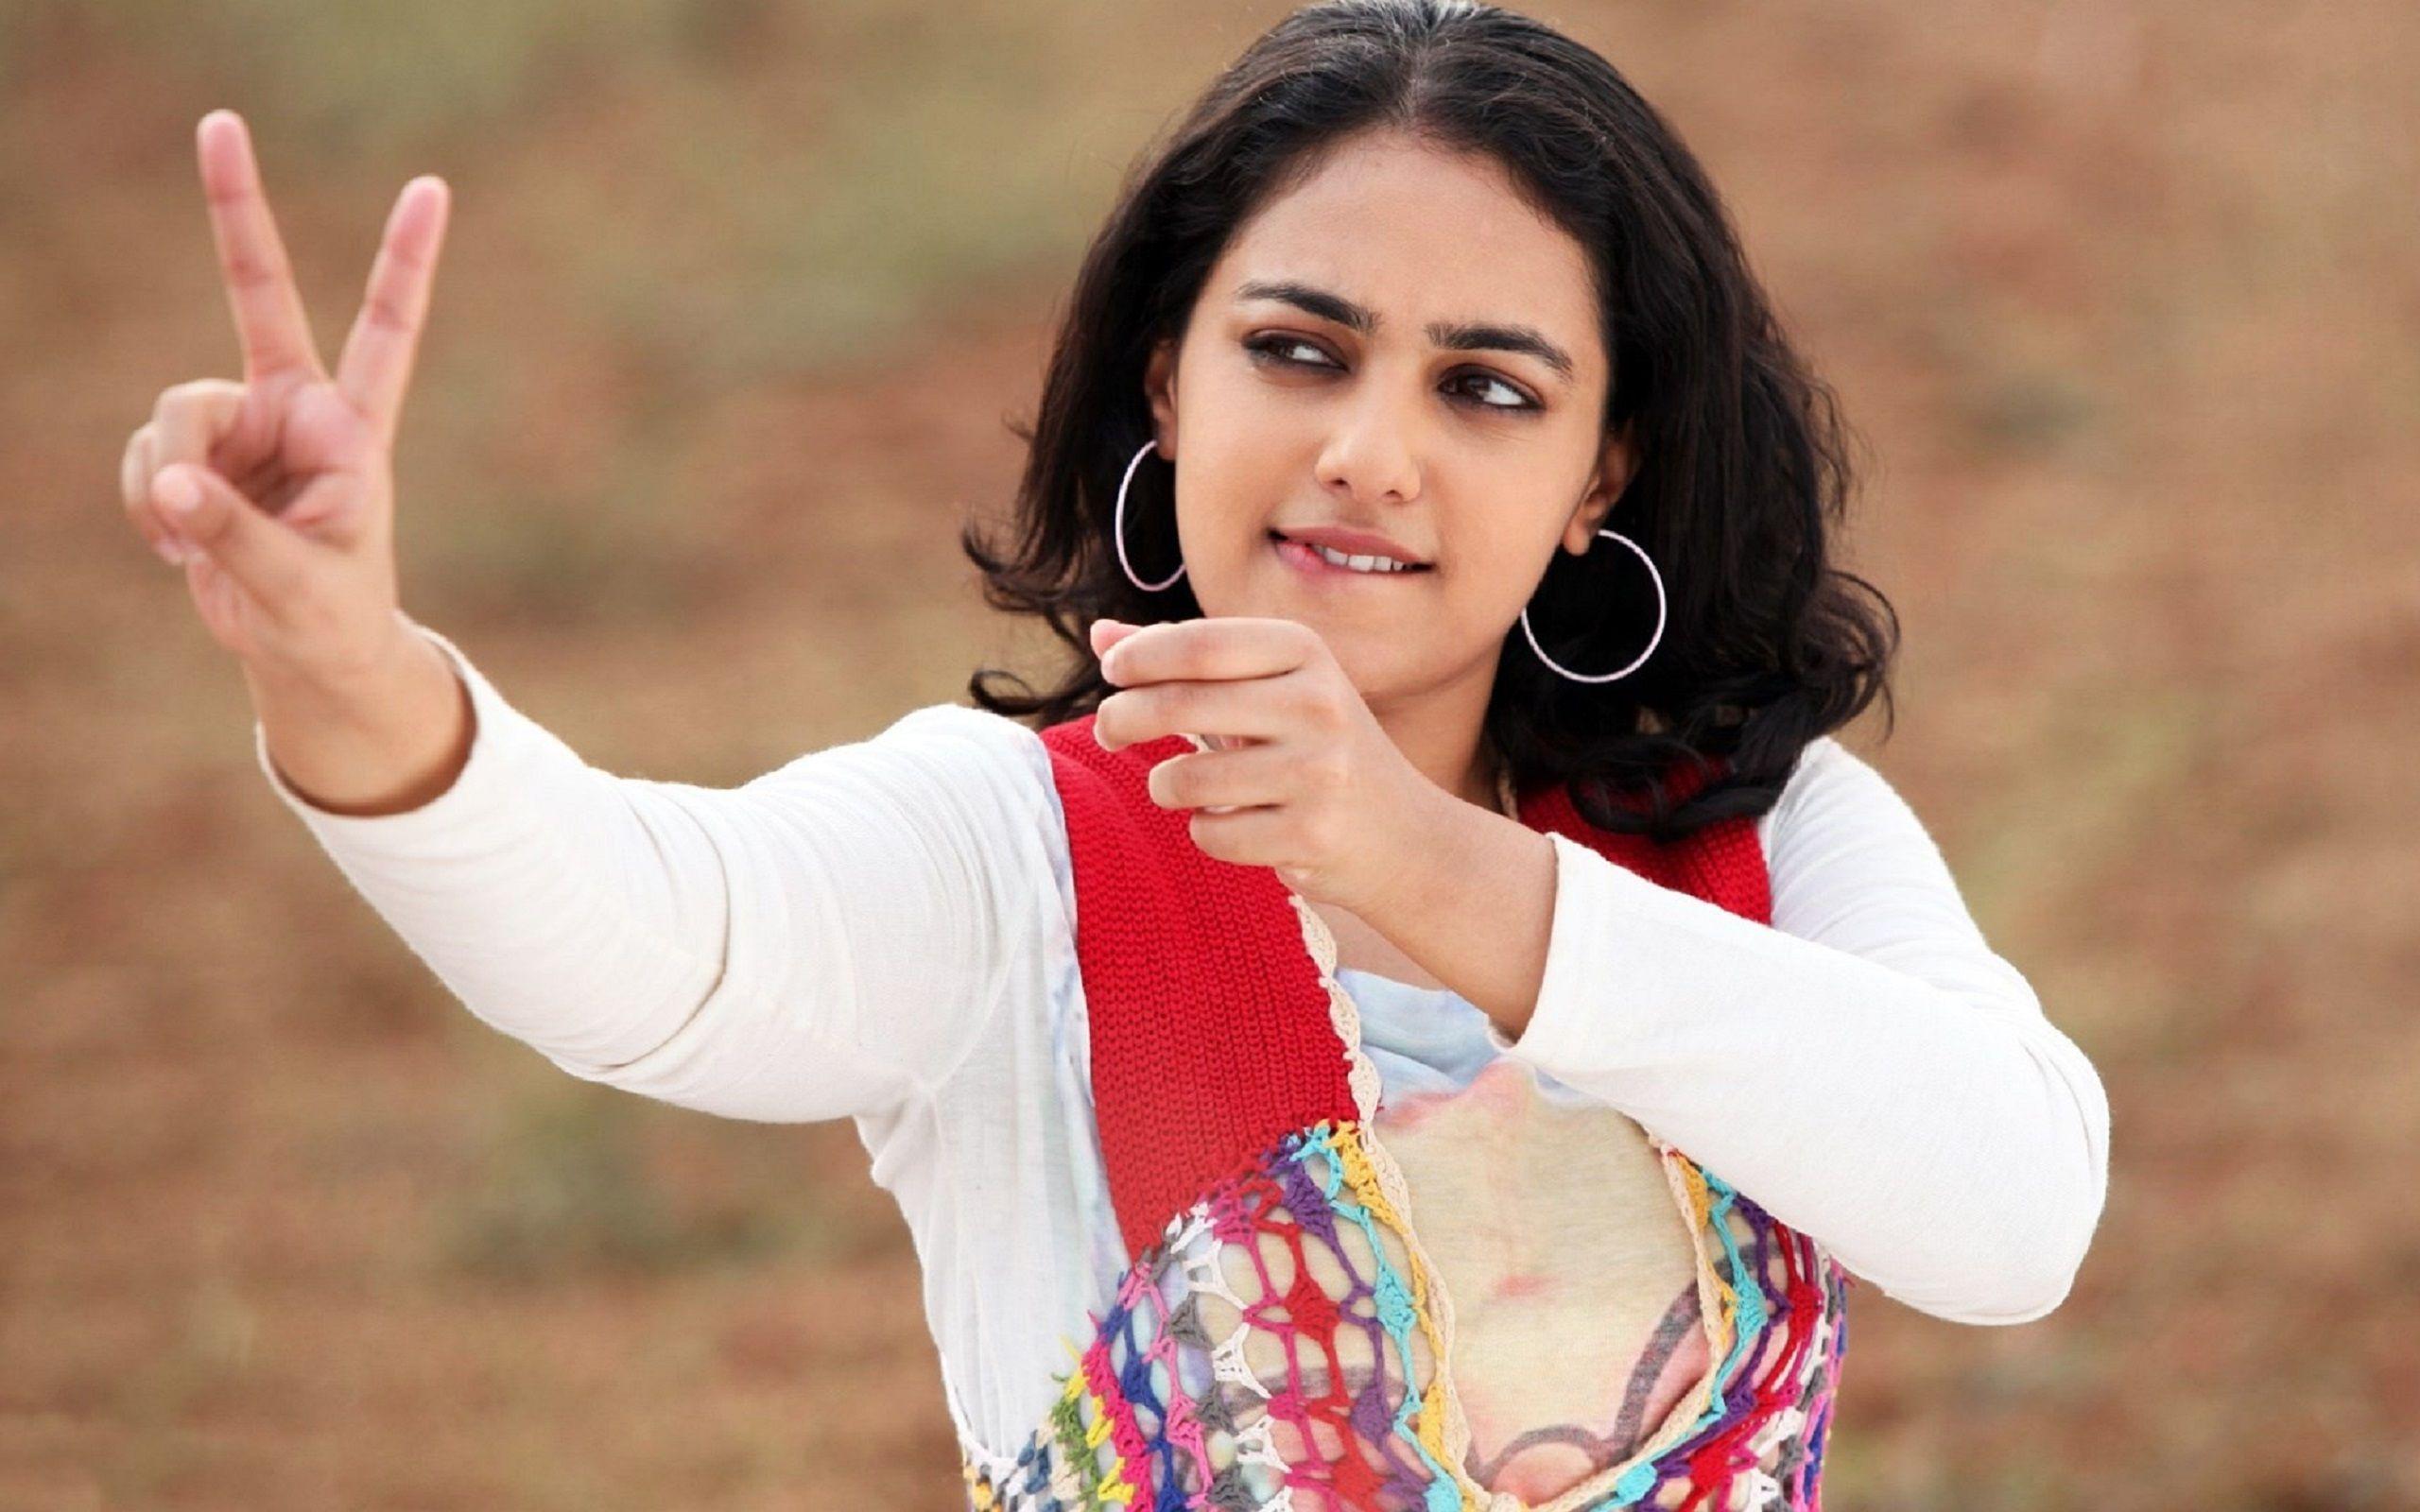 actress nithya menon wallpaper - http://www.hd1080pwallpaper.in